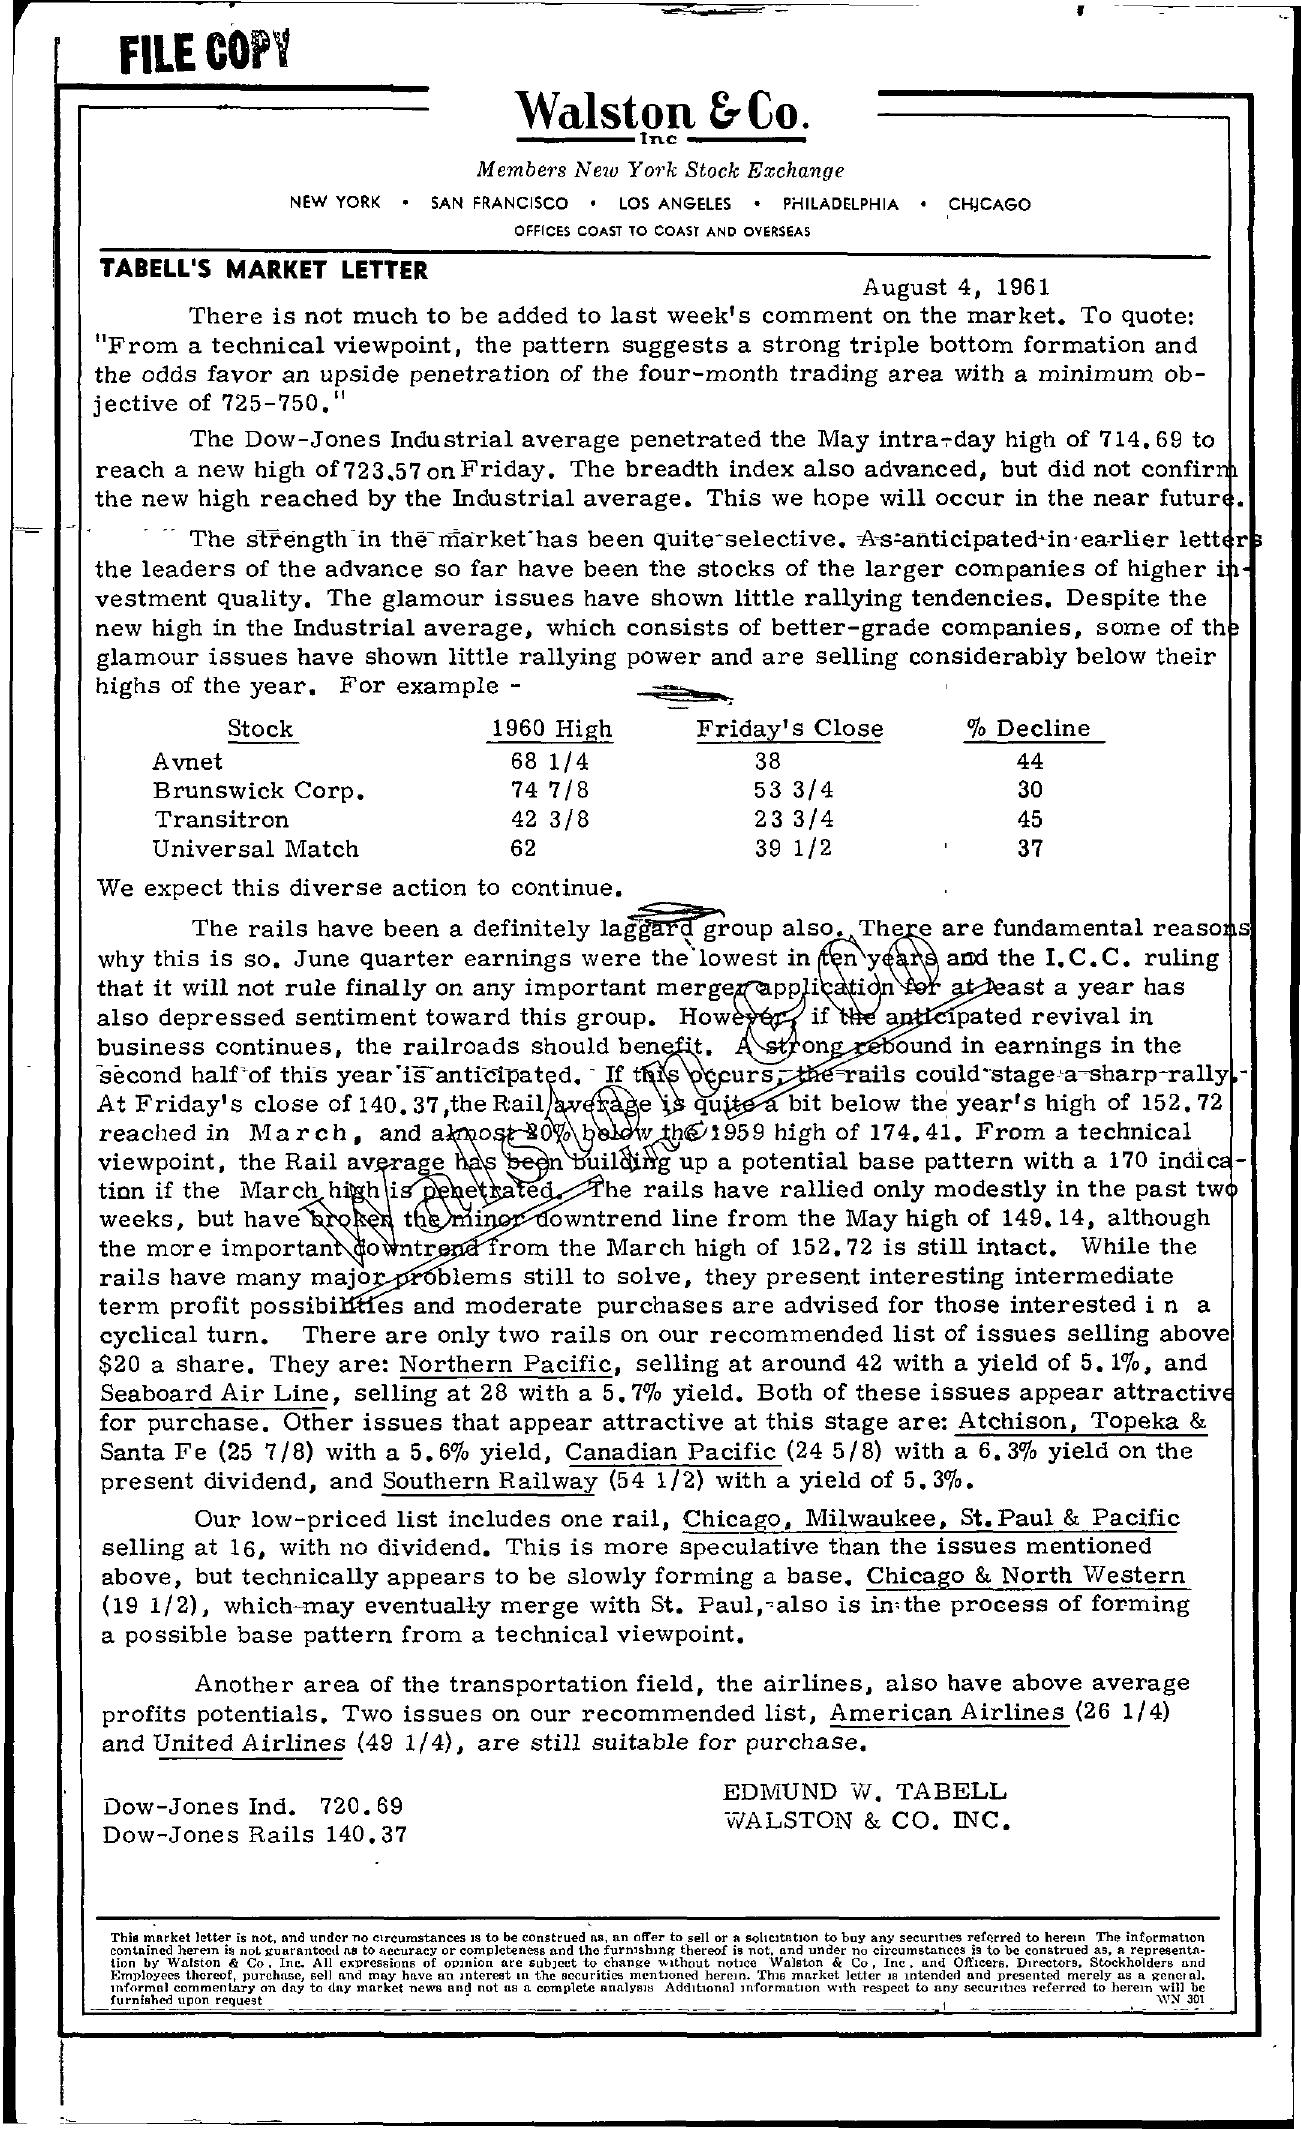 Tabell's Market Letter - August 04, 1961